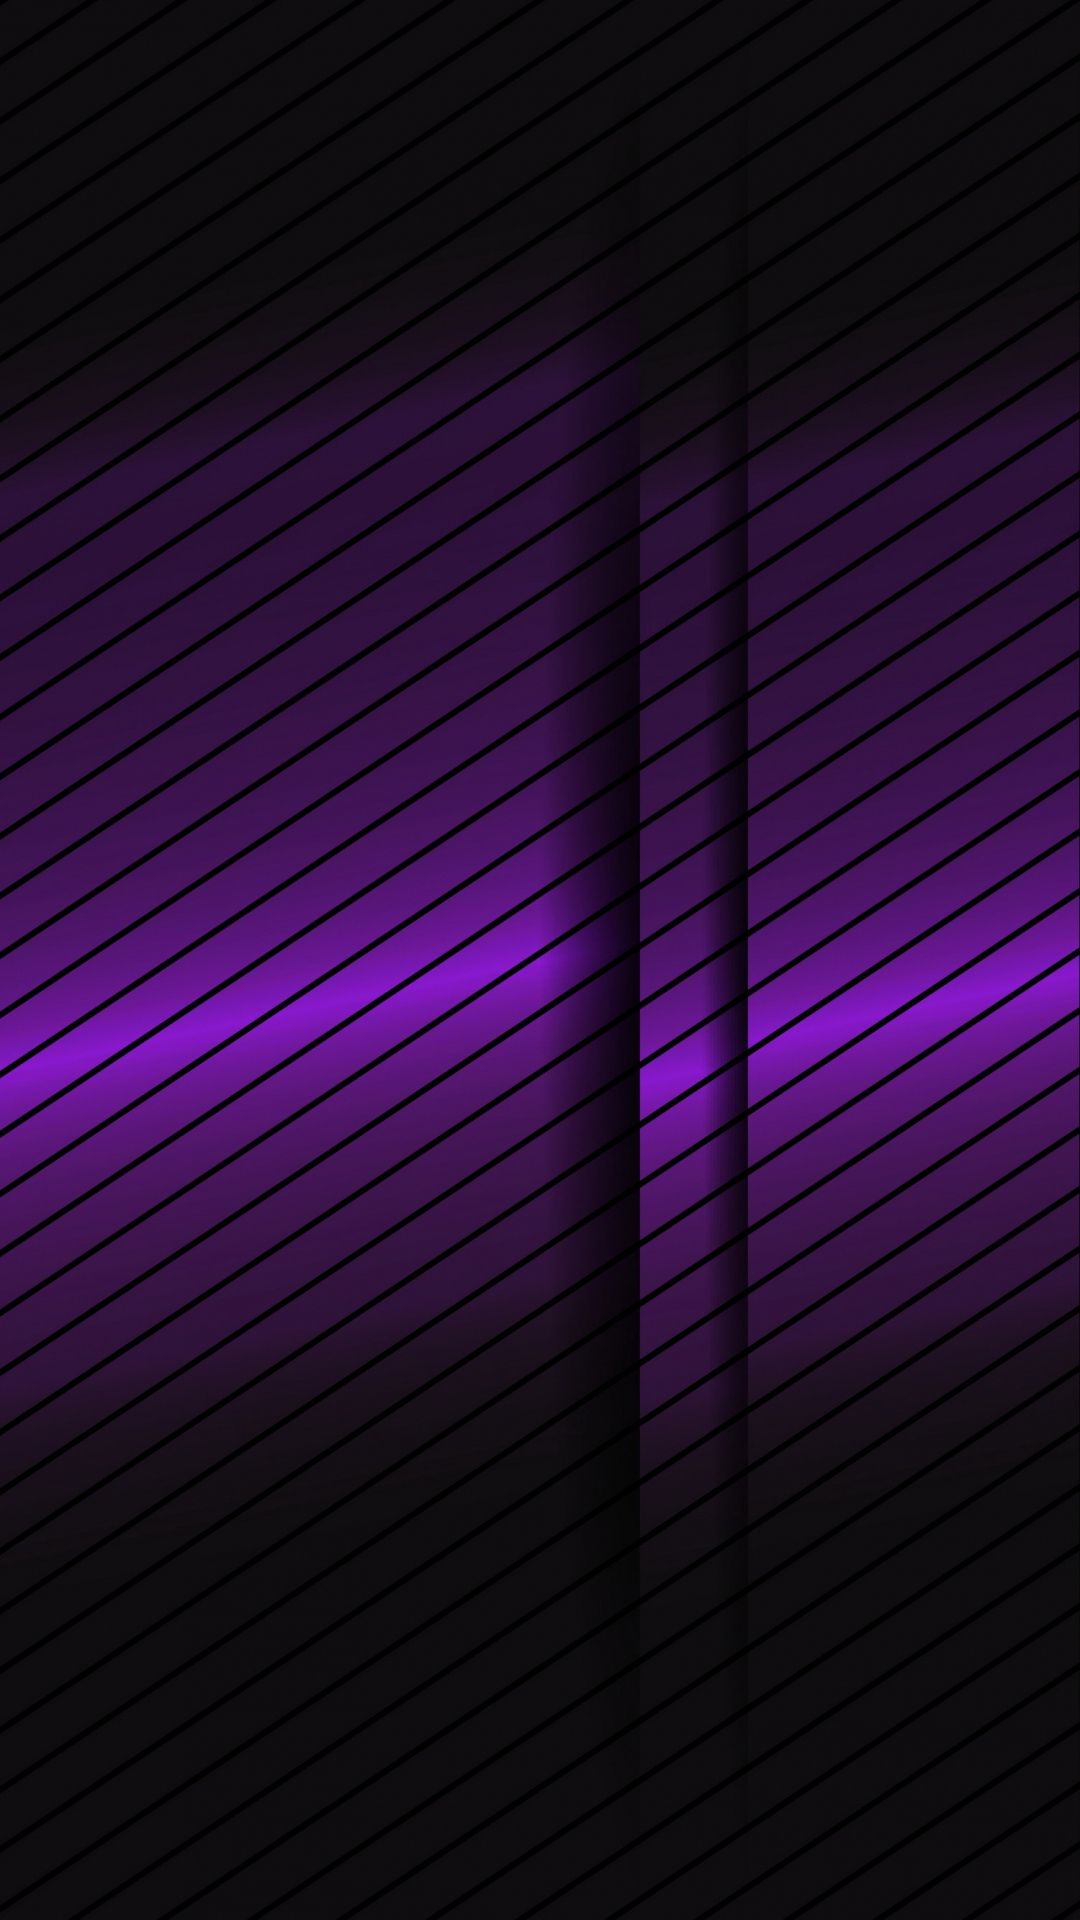 Abstraction Line Purple iPhone 6 wallpaper Purple